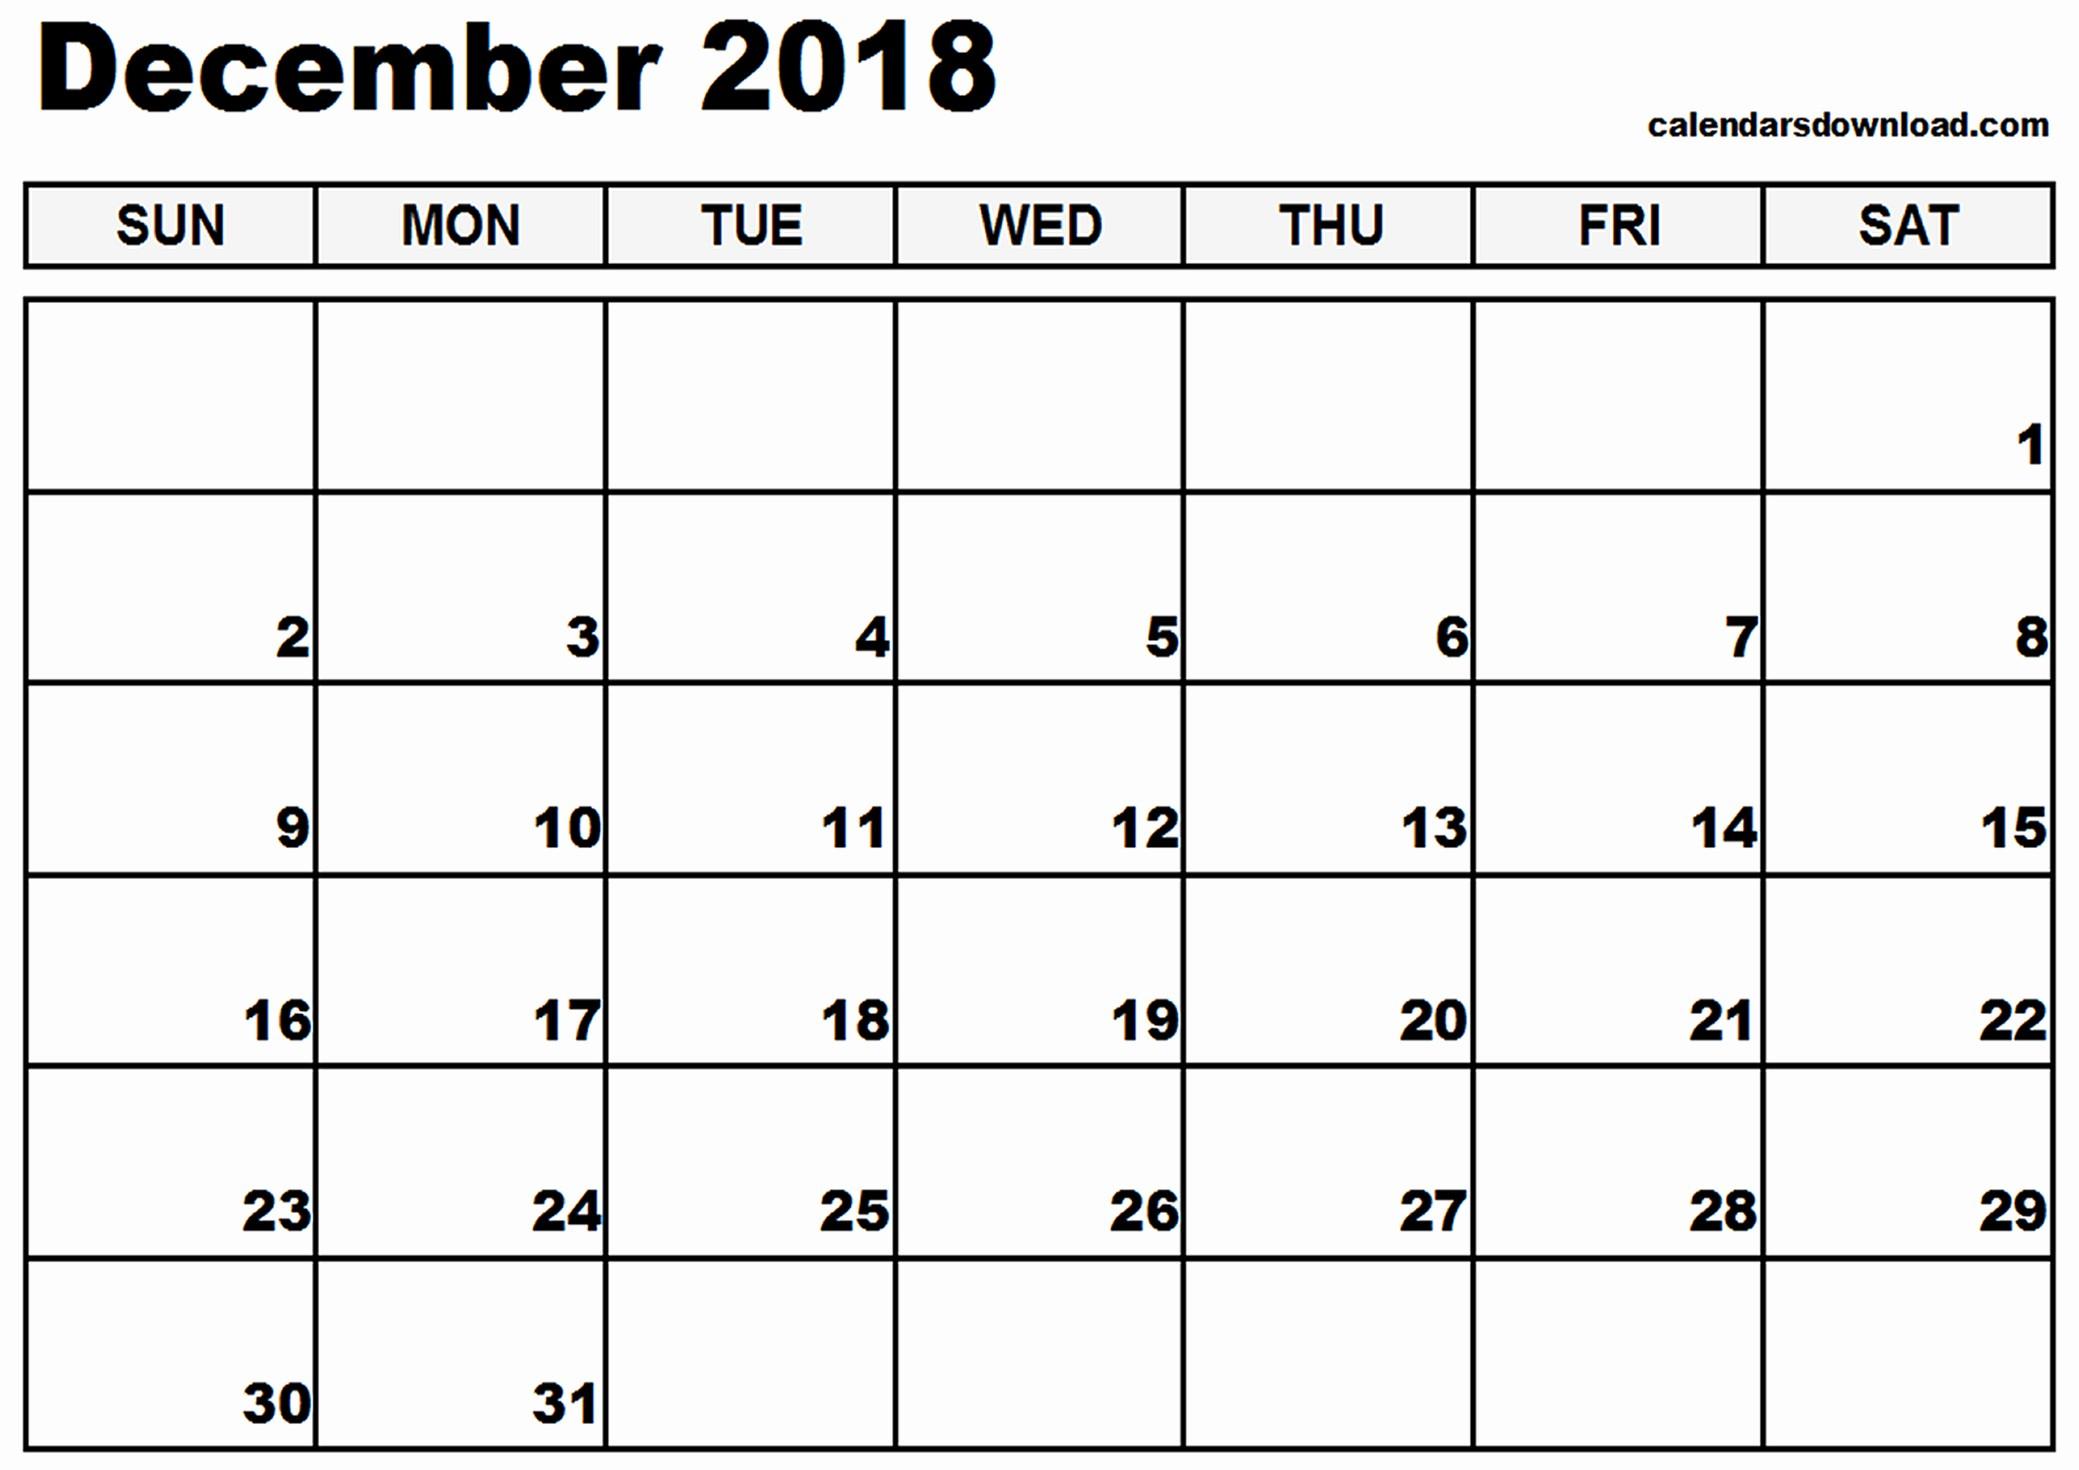 Blank Calendar Template December 2018 Fresh December 2018 Printable Calendar